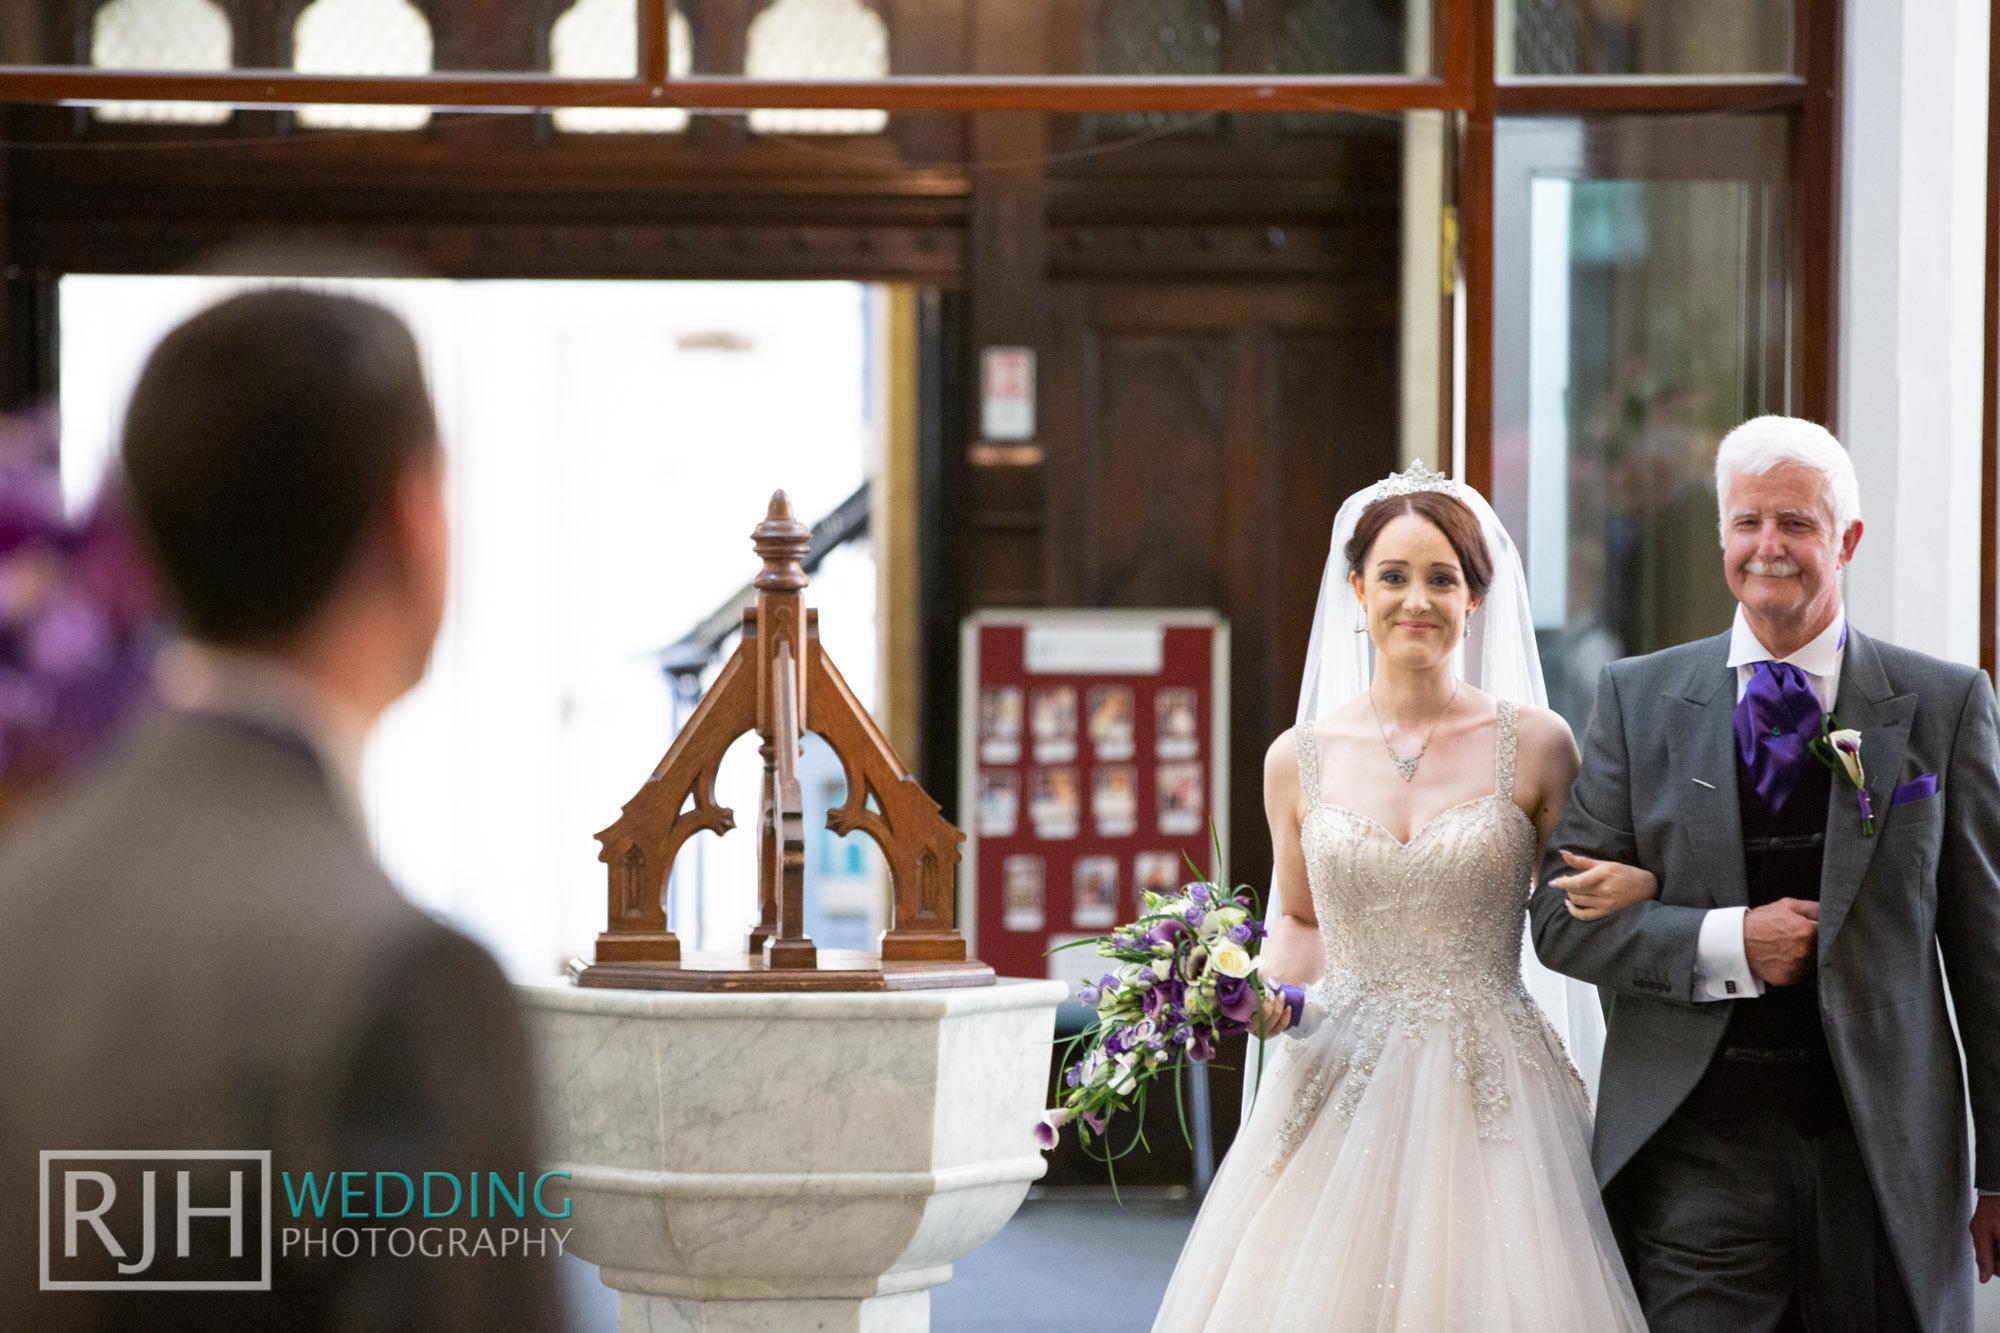 Oulton Hall Wedding Photography_Goodwill-Hall_020_RJH17292.jpg